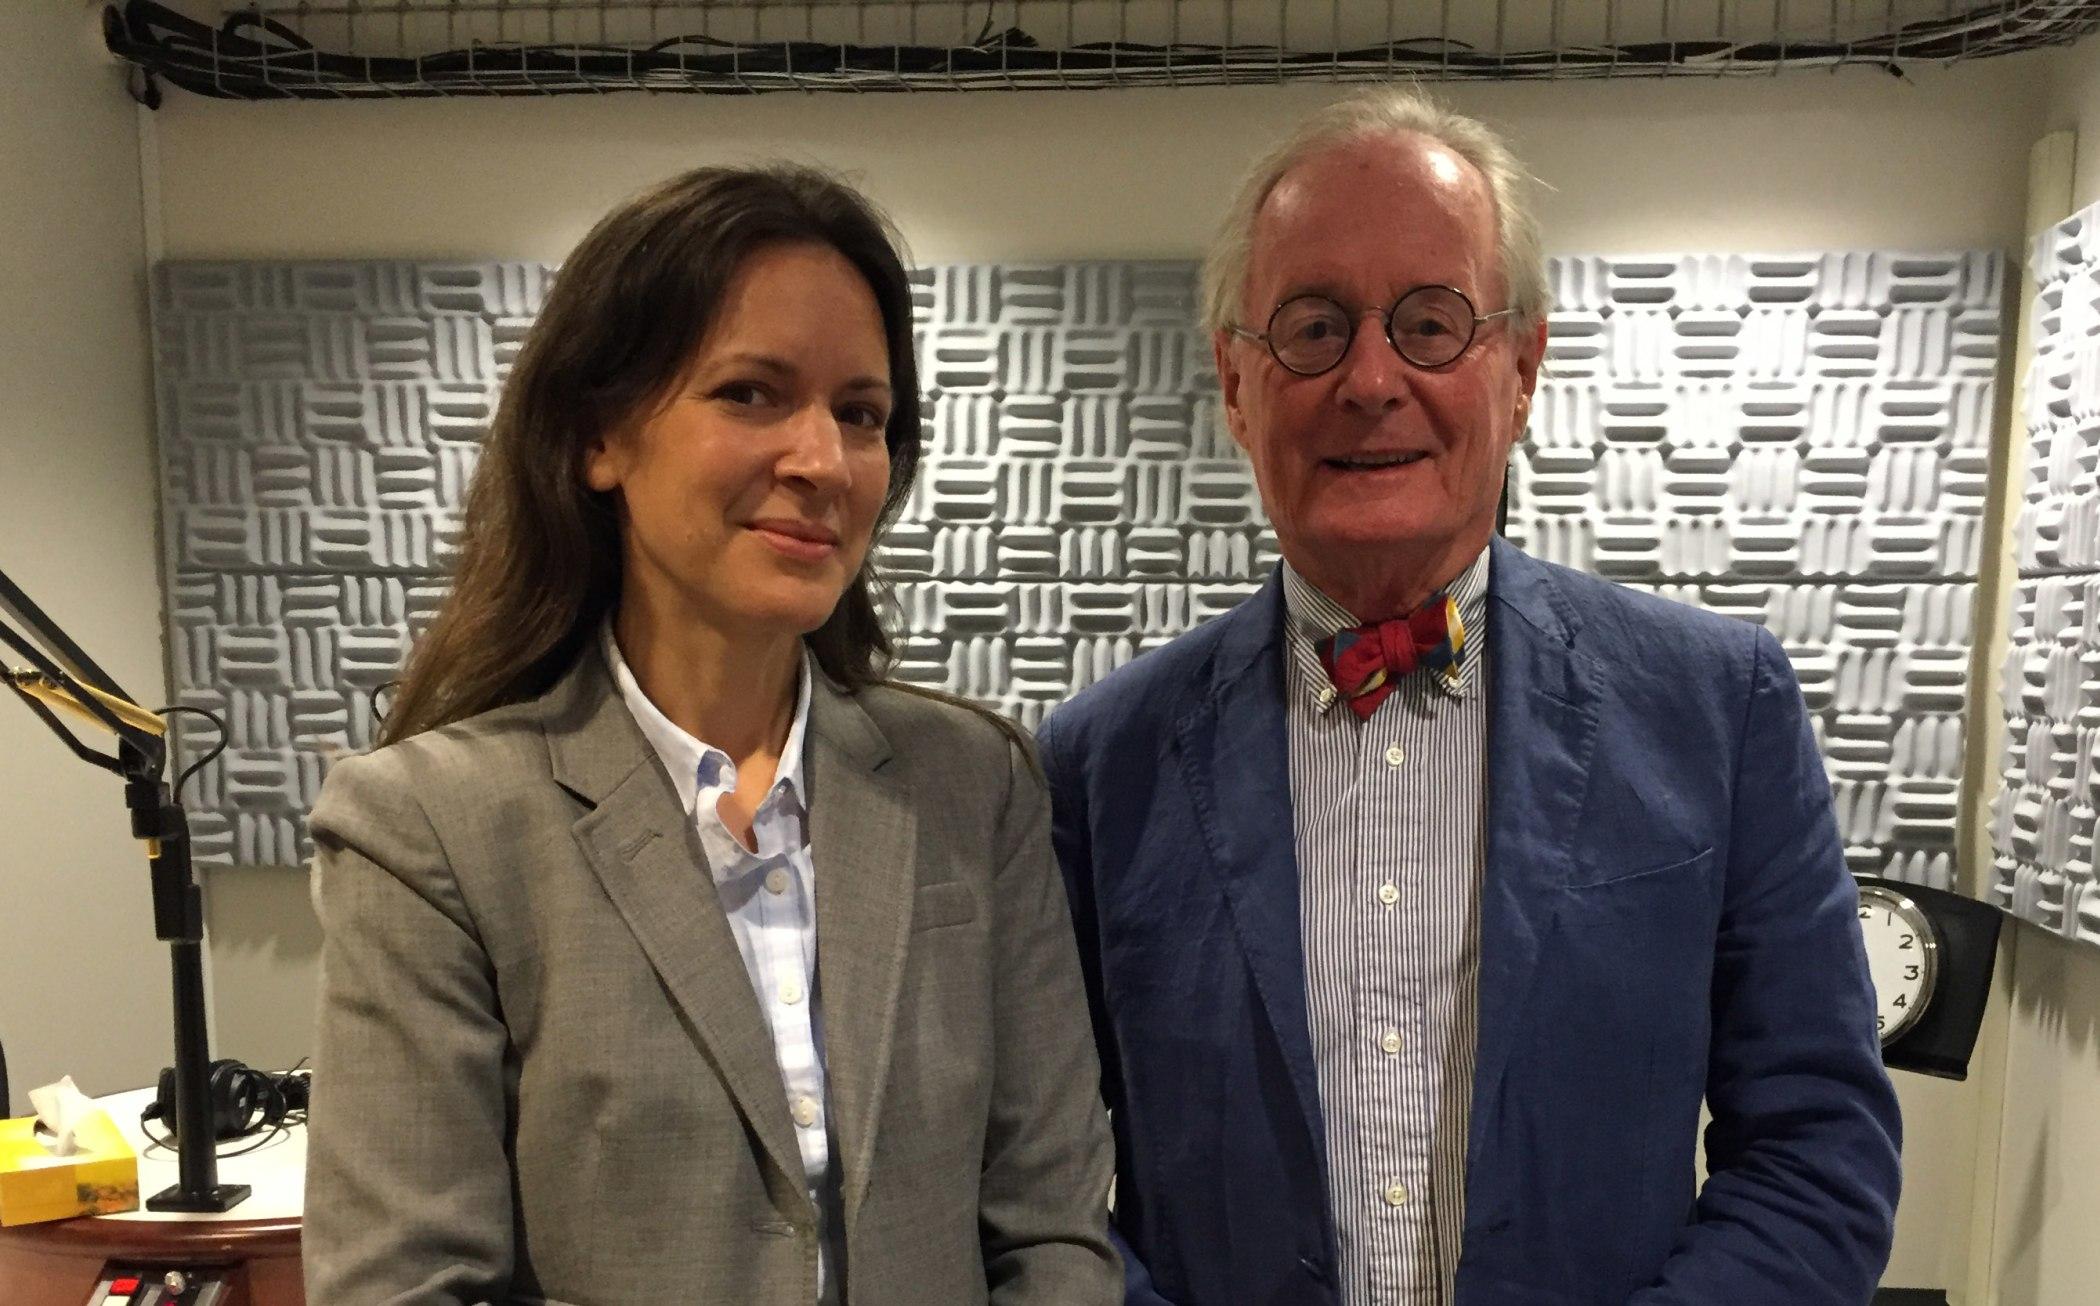 Lydia Dugdale (l) and Thomas P. Duffy (r)